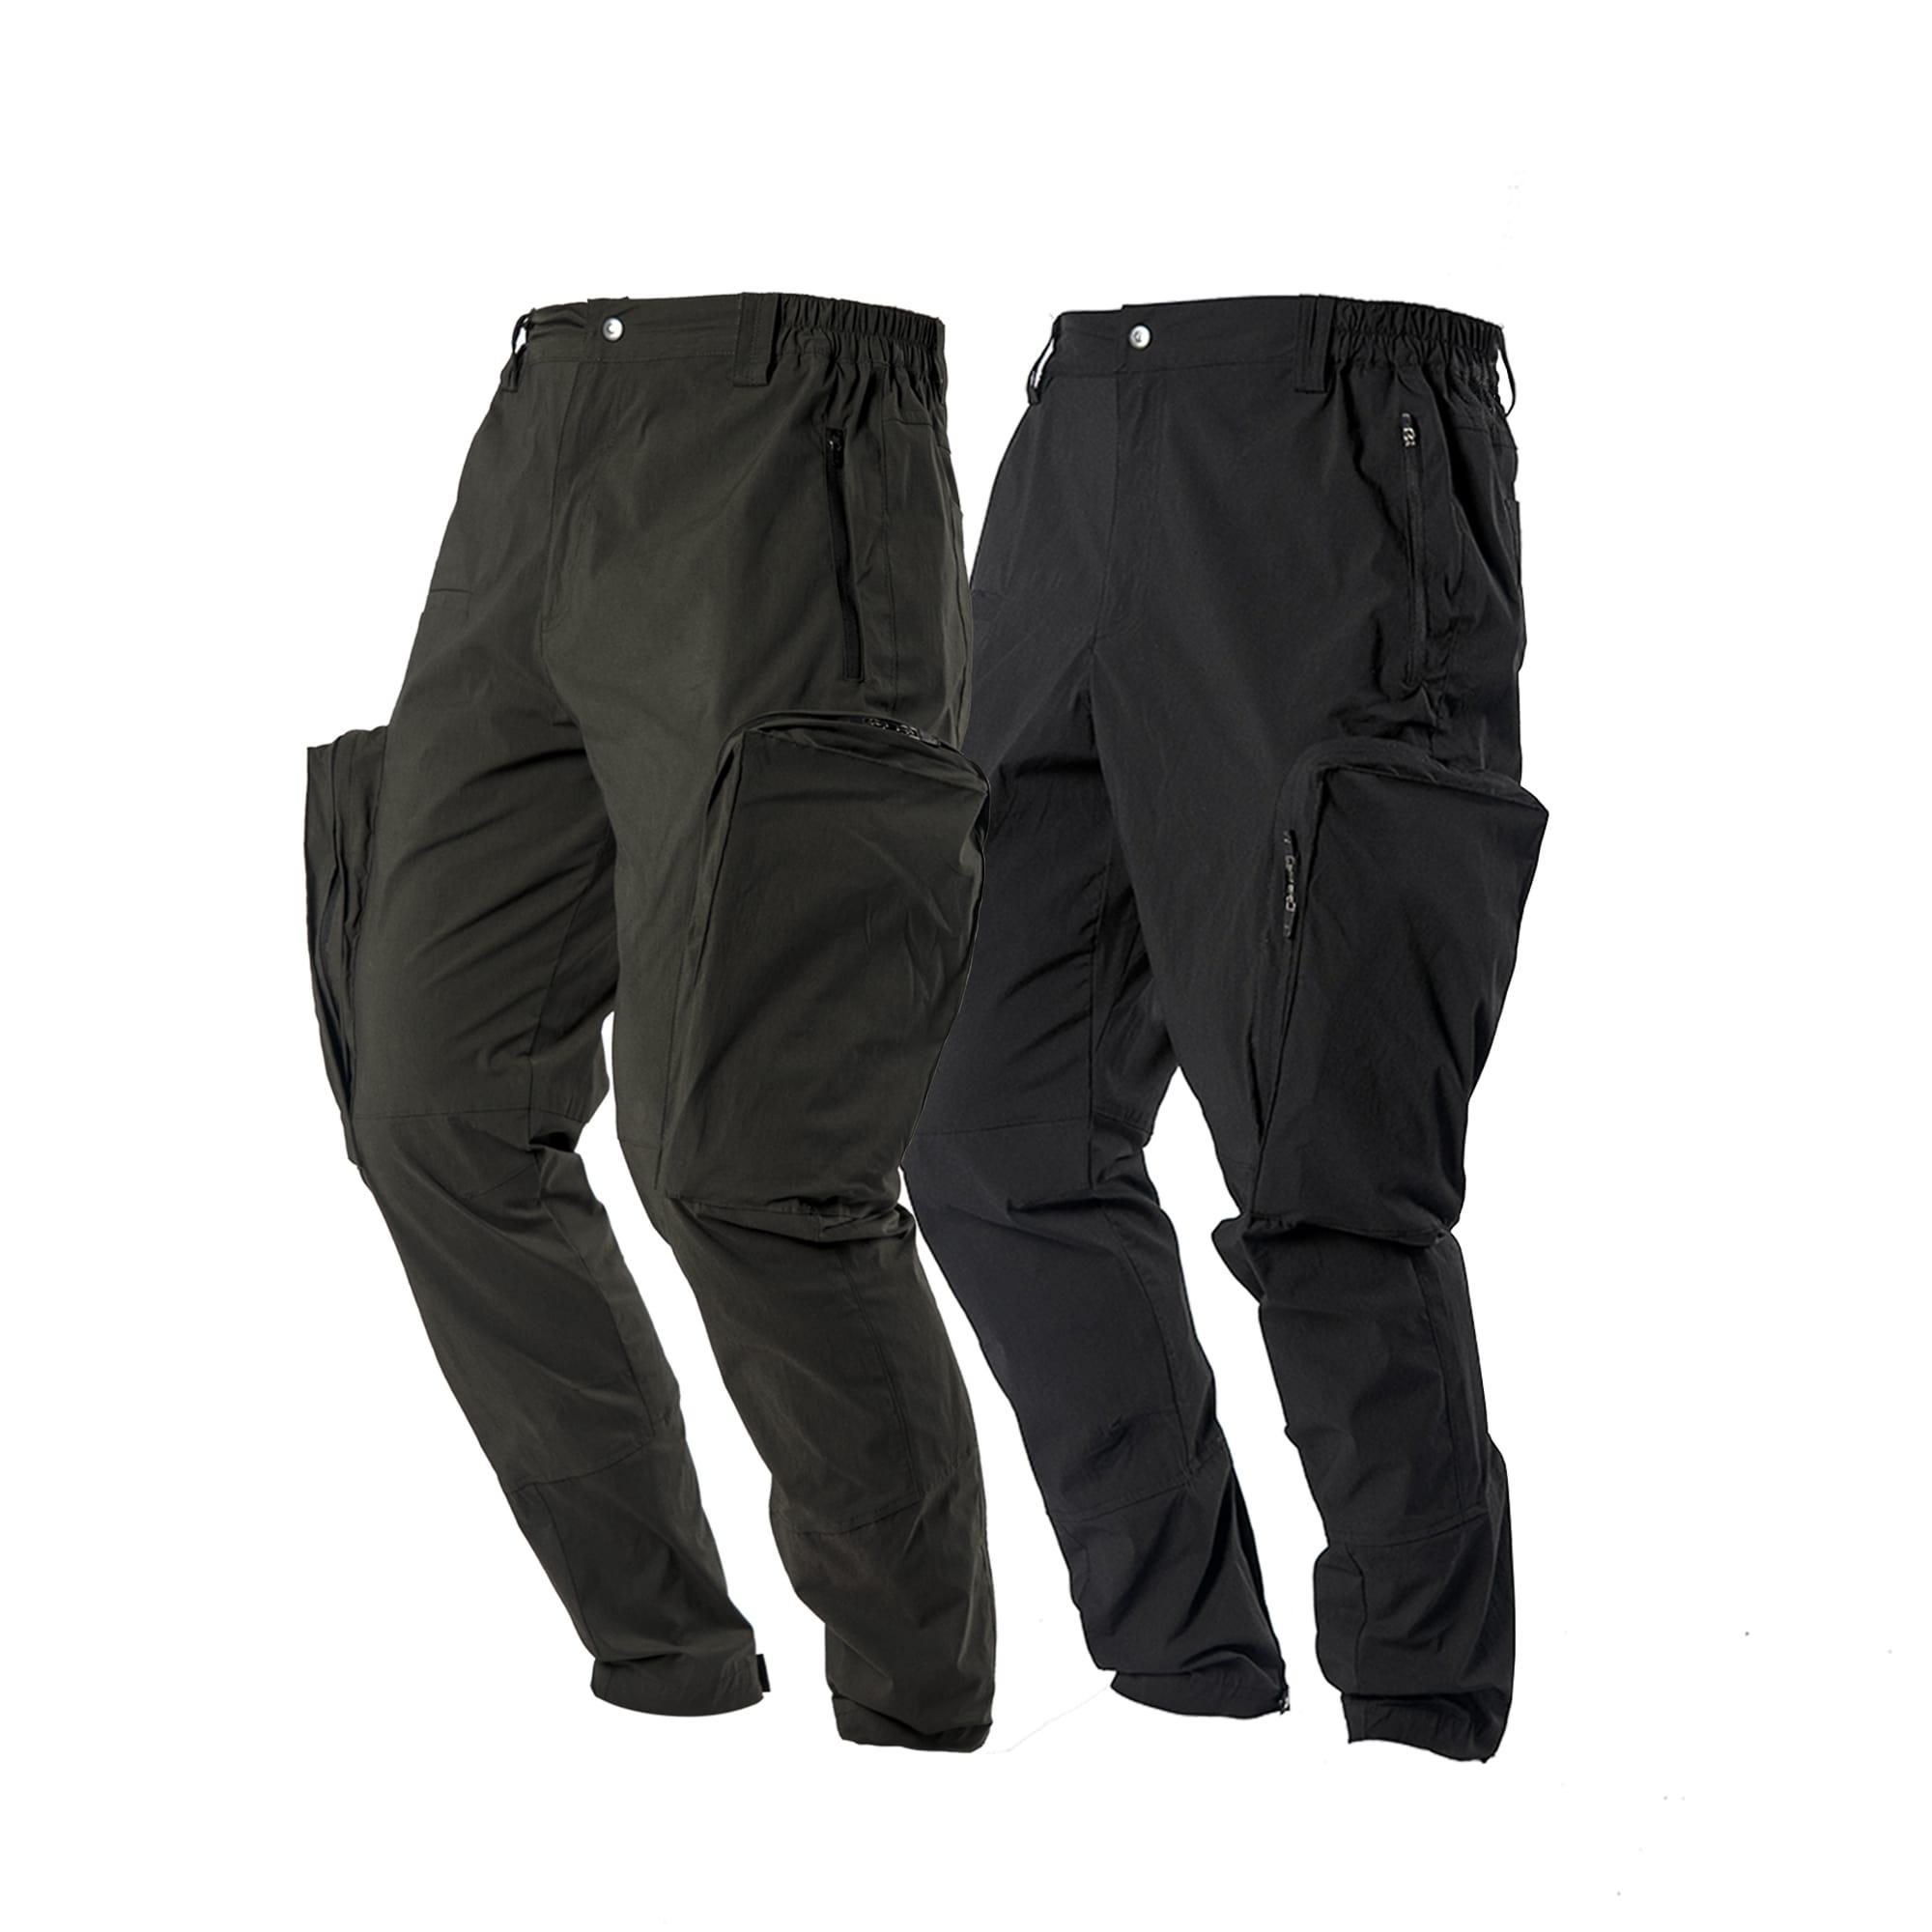 Pupil Travel N05 techwear trousers